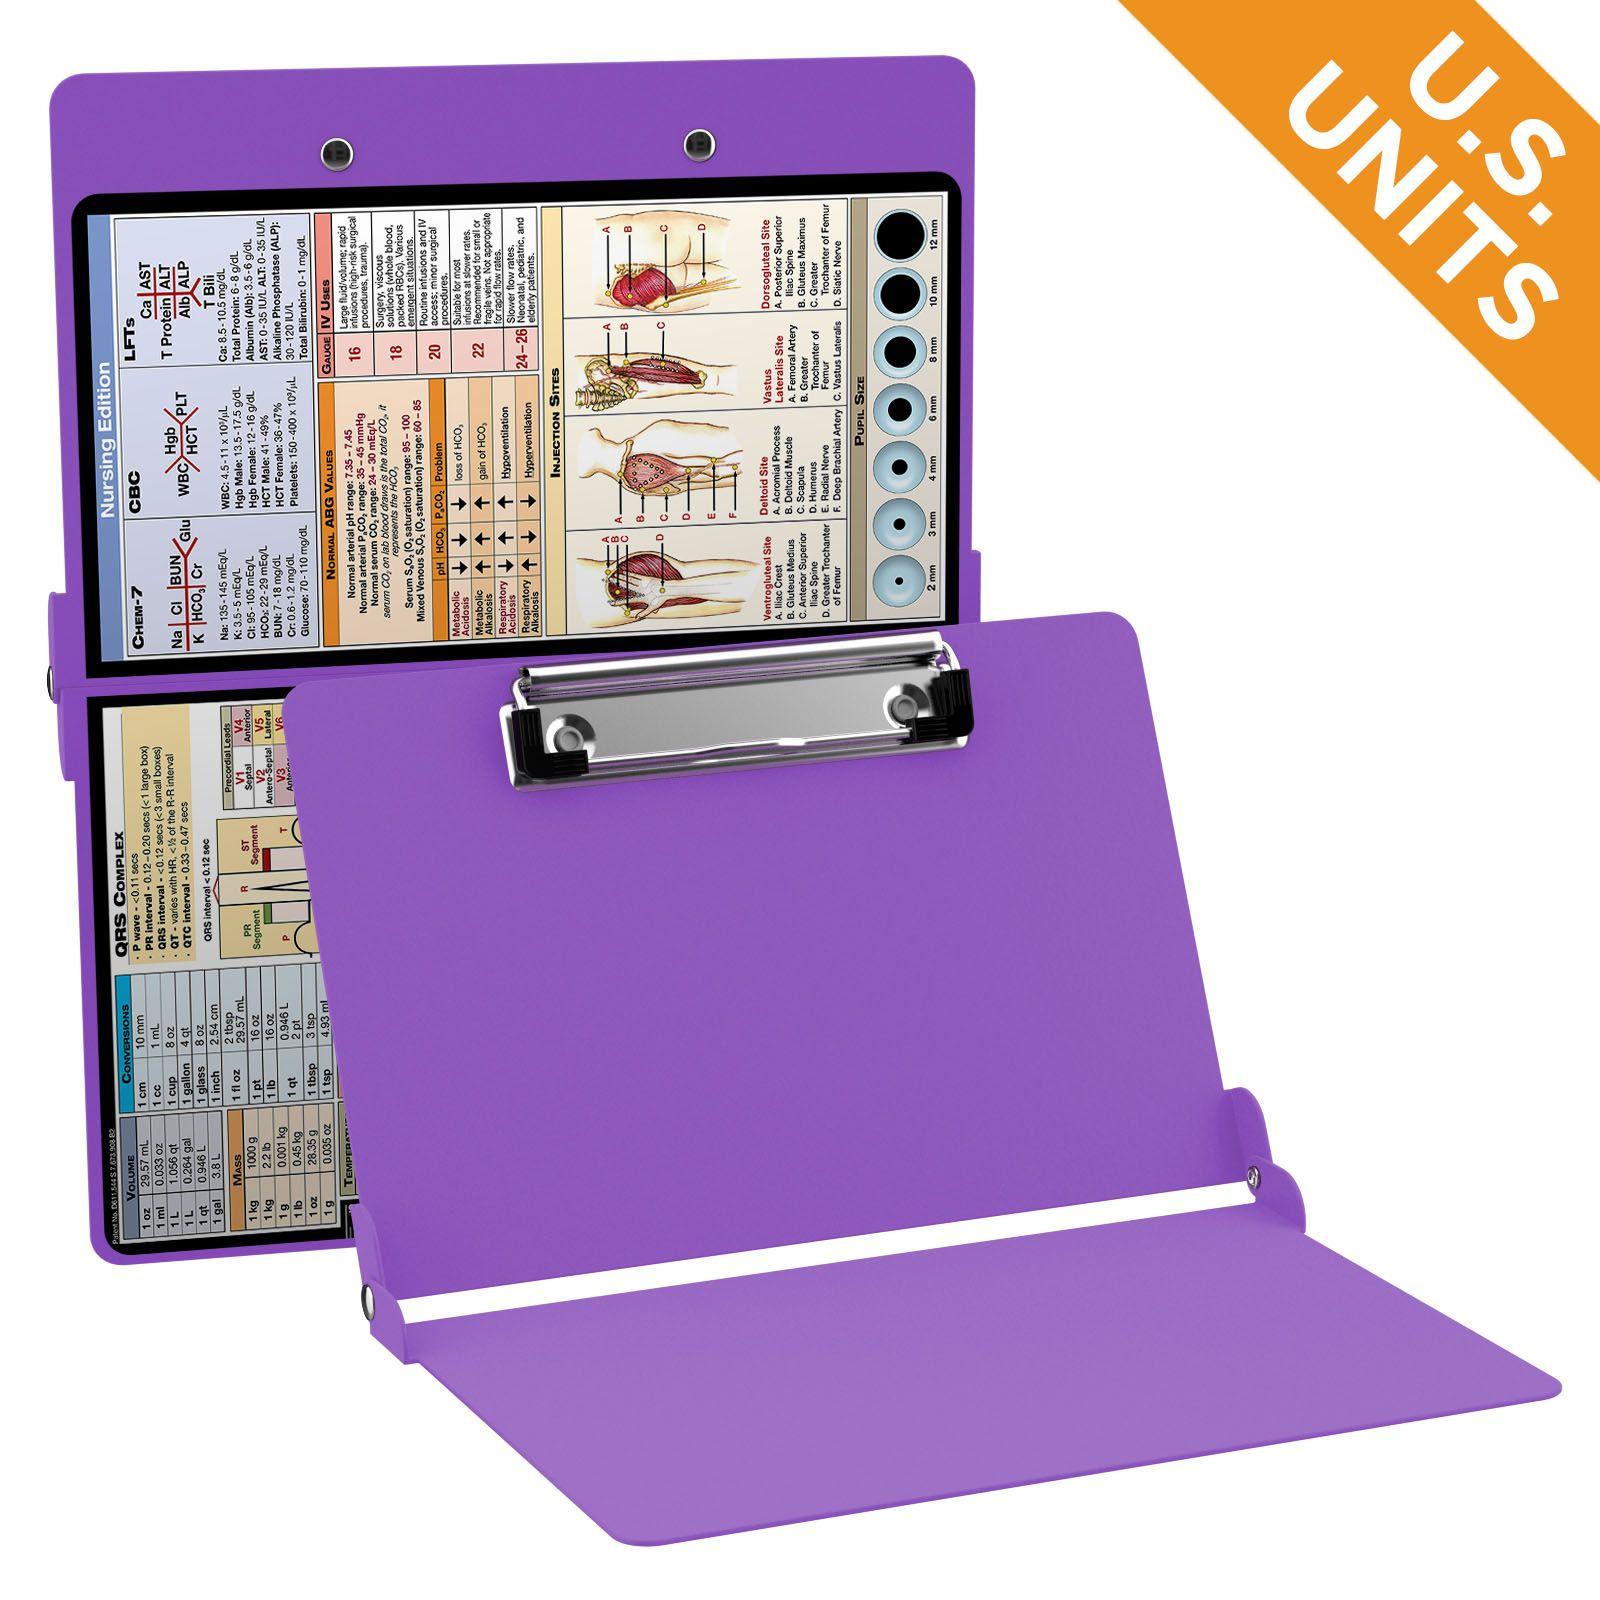 WhiteCoat Clipboard - LILAC - Nursing Edition - Full size nursing pocket clipboard from WhiteCoat Clipboards.